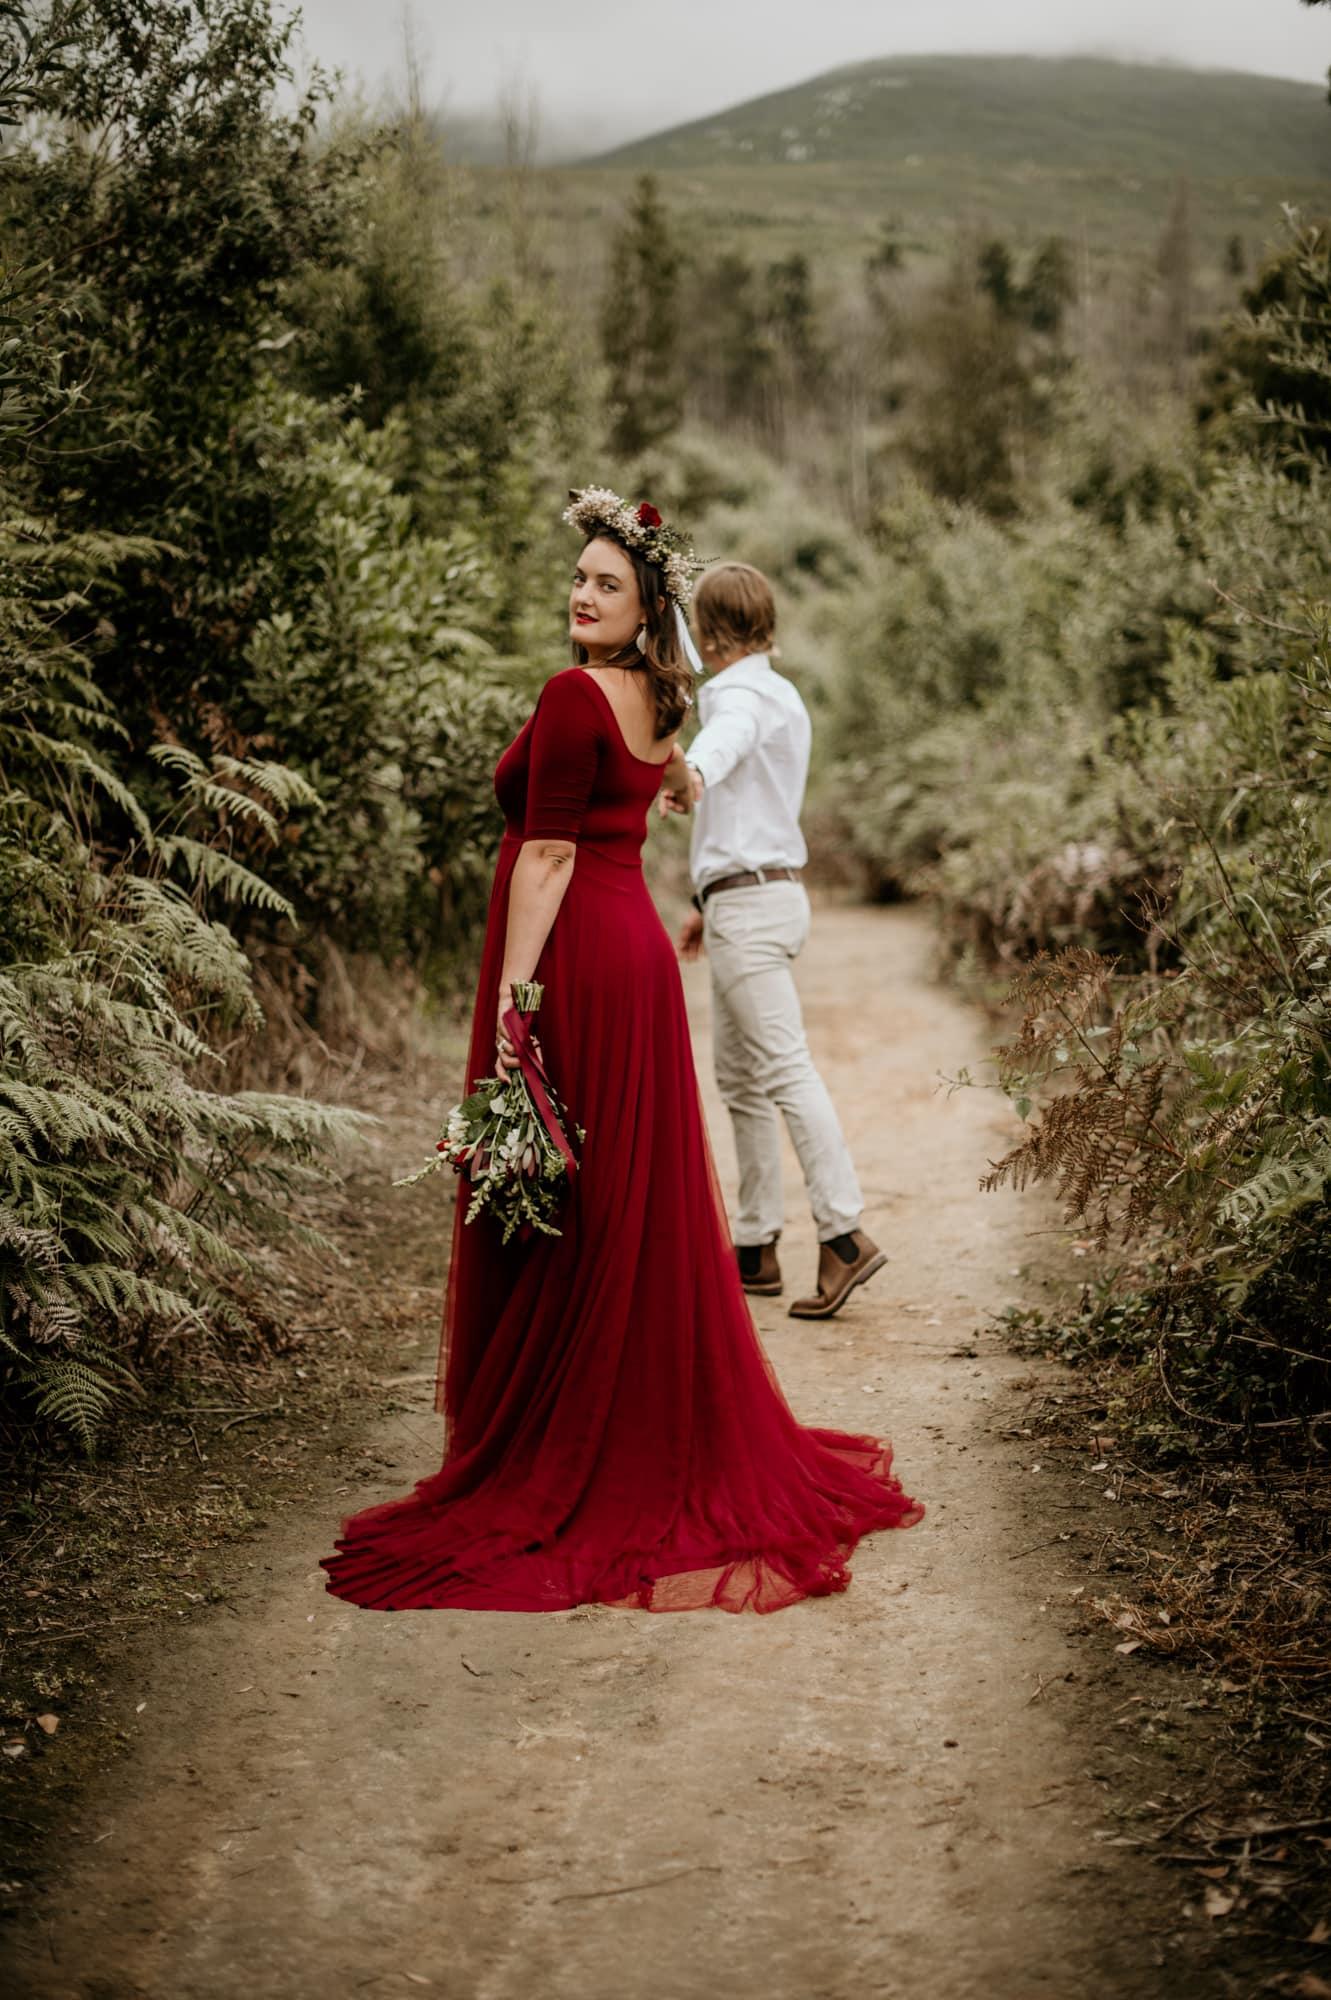 wesley-lanie-george-fernridge-engagement-June-Richards-Photography-Destination-Weddings-Elopements-Garden-Route-22